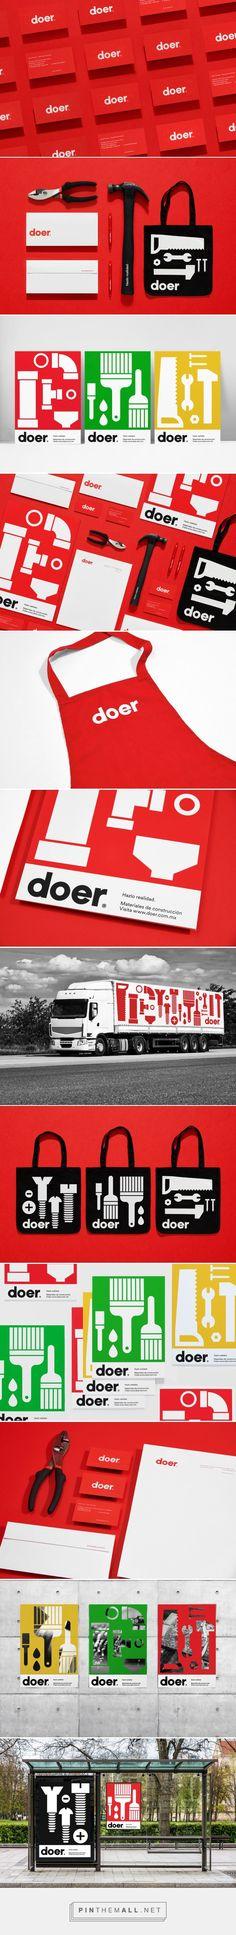 Doer Home Improvement Store Branding by Parámetro Studio | Logo Designer Bradenton, Web Design Sarasota, Tampa Fivestar Branding Agency #homeimprovement #branding #brand #brandinginspiration #design #advertising #designinspiration